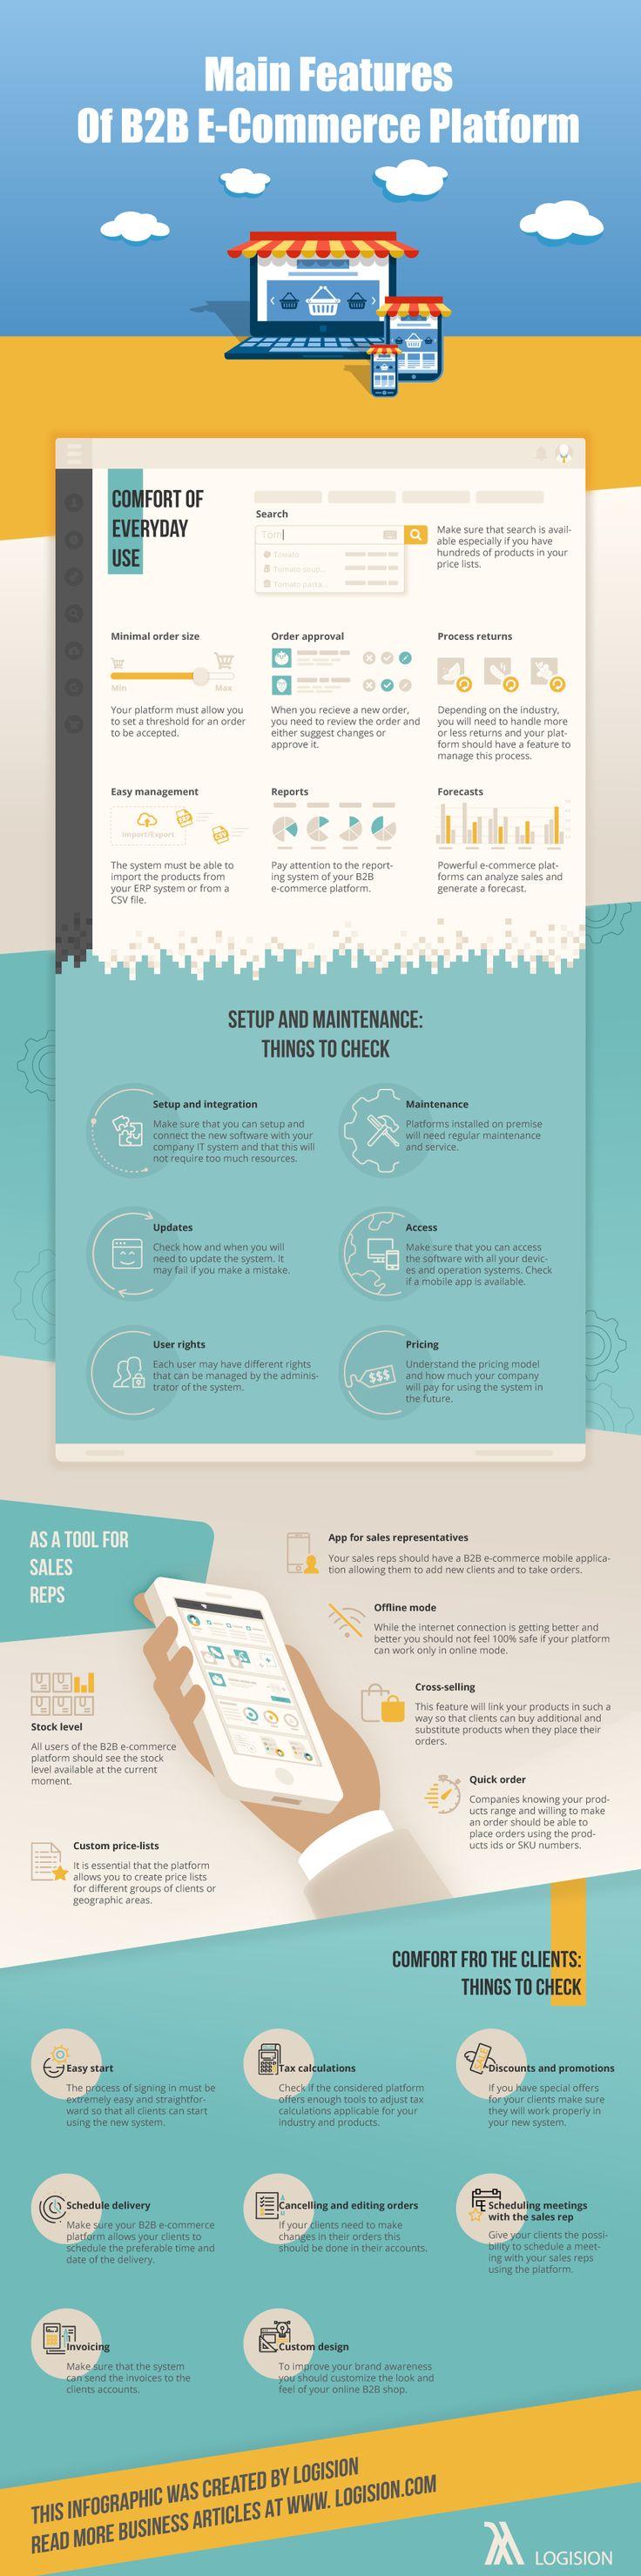 28 Key Features of B2B e-Commerce Platform - UPDATED 2017